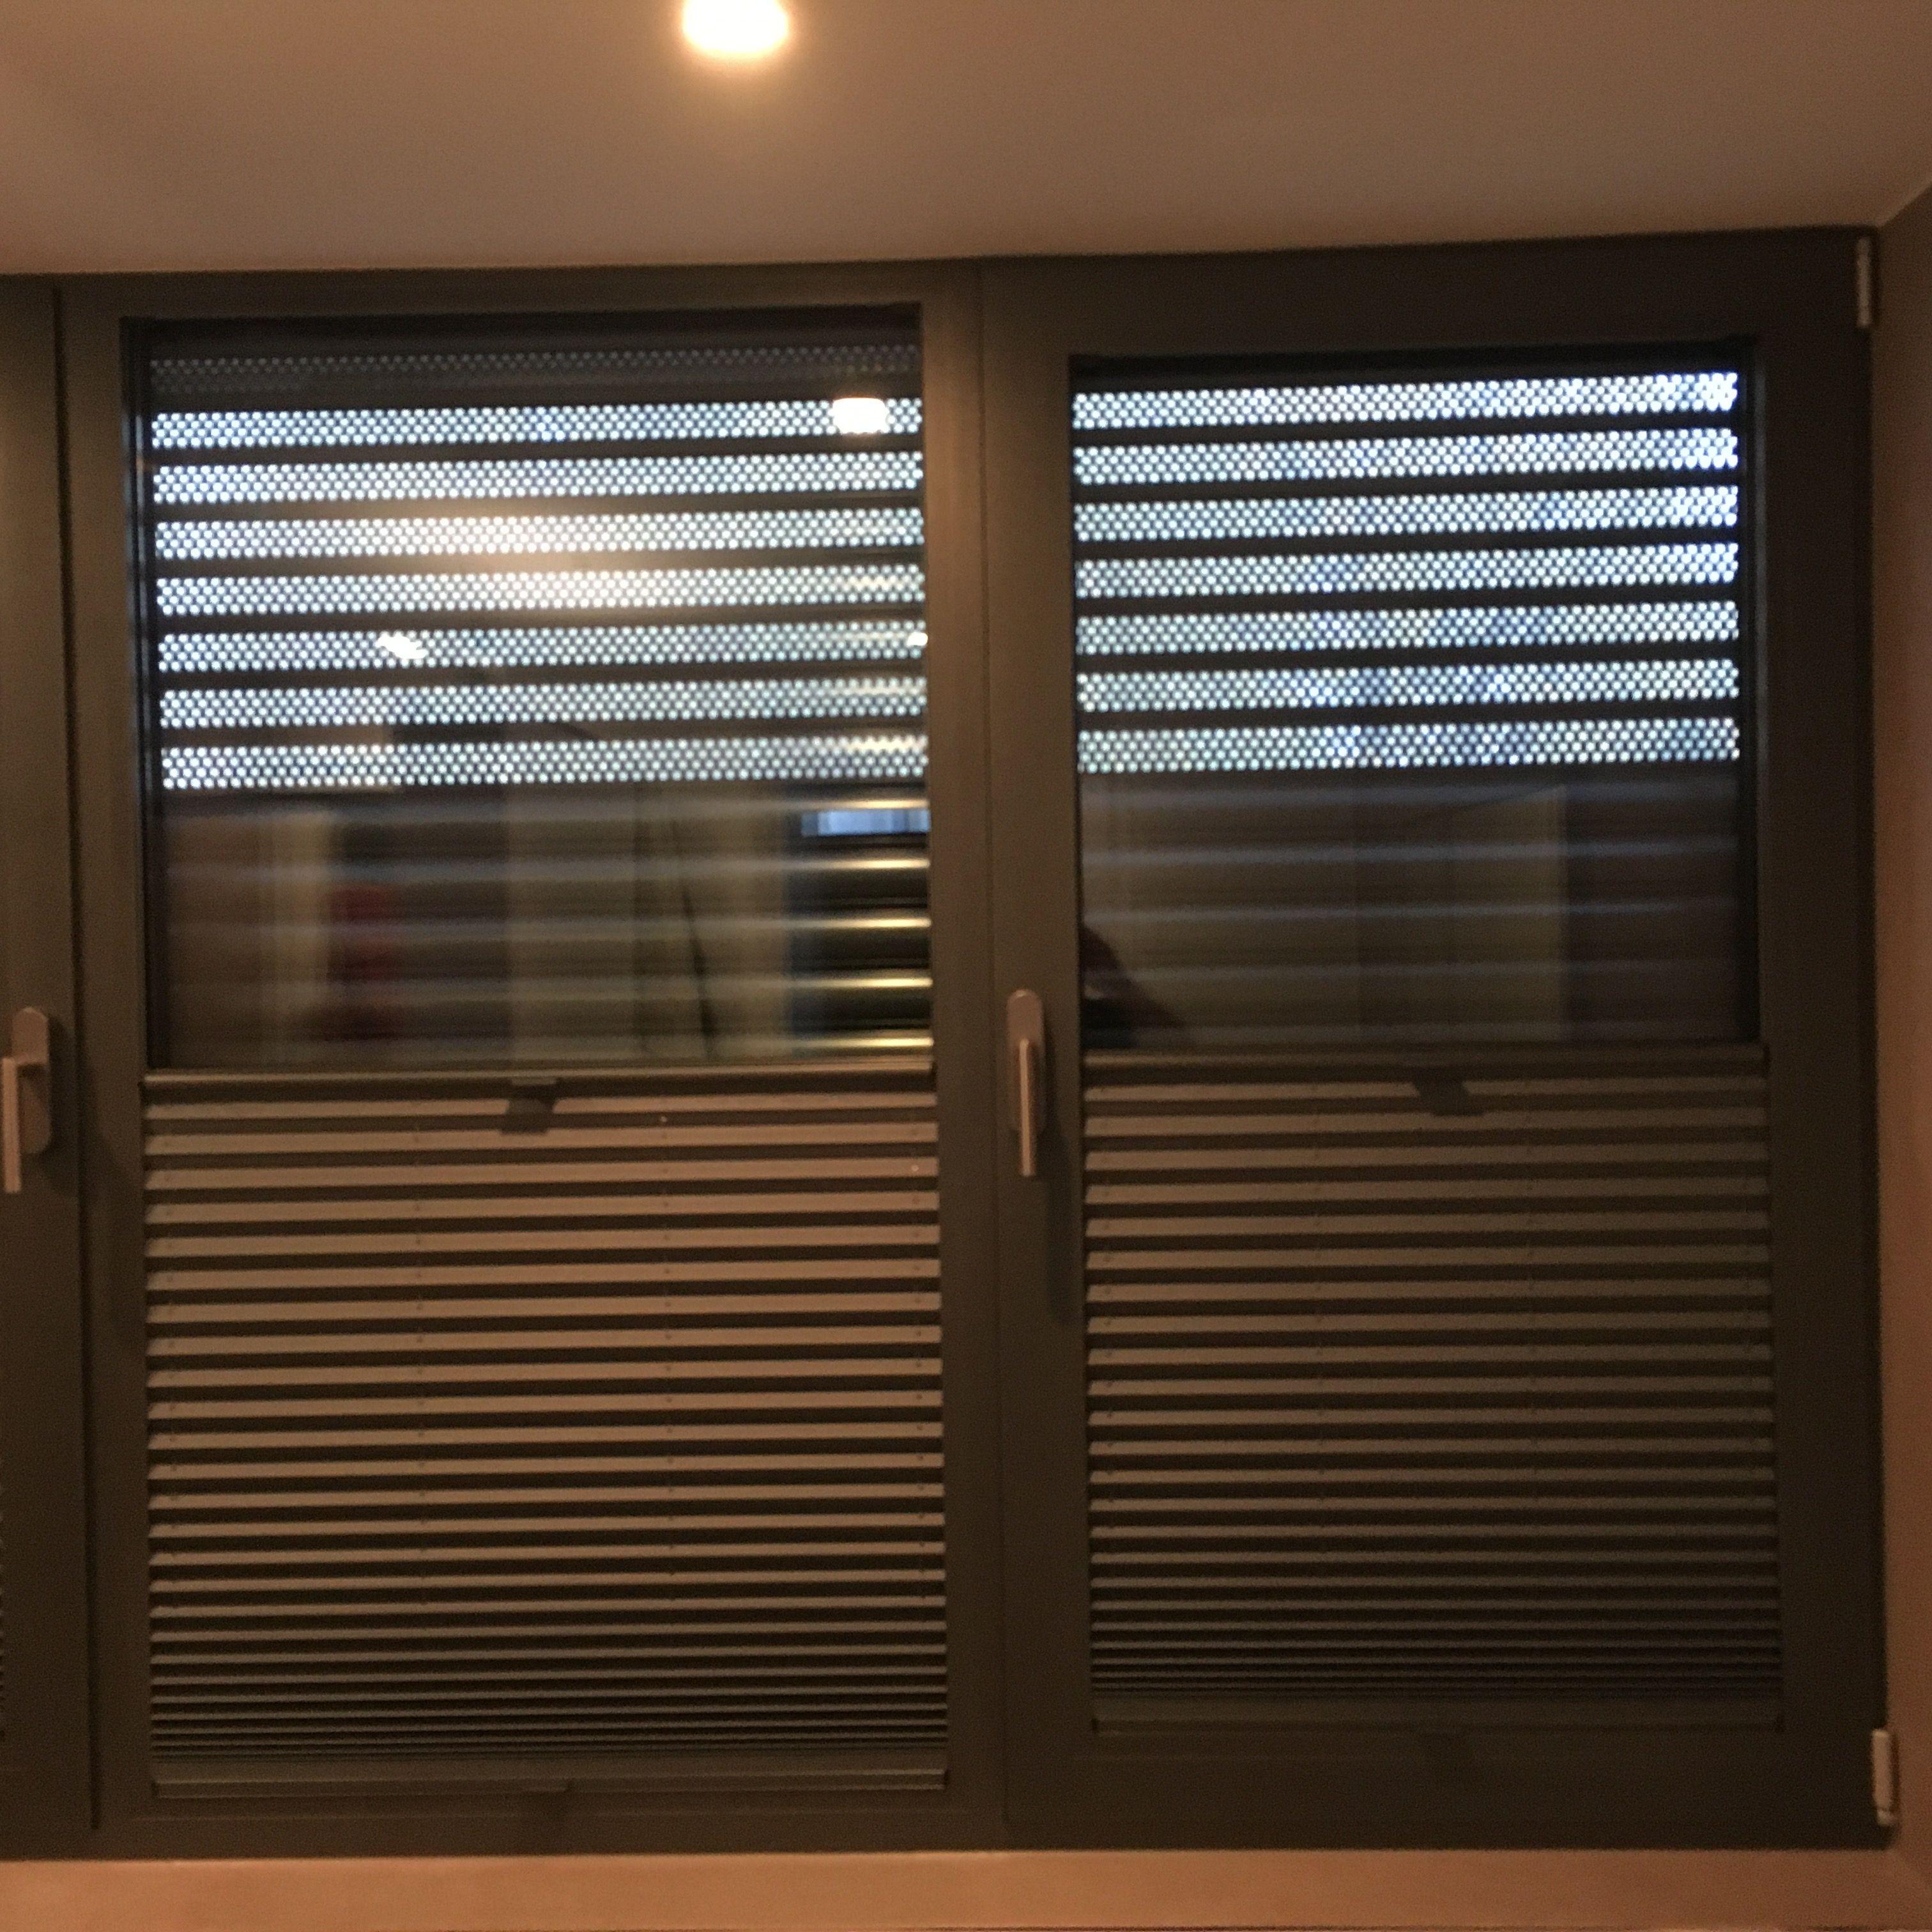 Alulux Qompact Rollladen Mit Luftungsgitter Rolladen Fenster Rollladen Sichtschutz Fenster